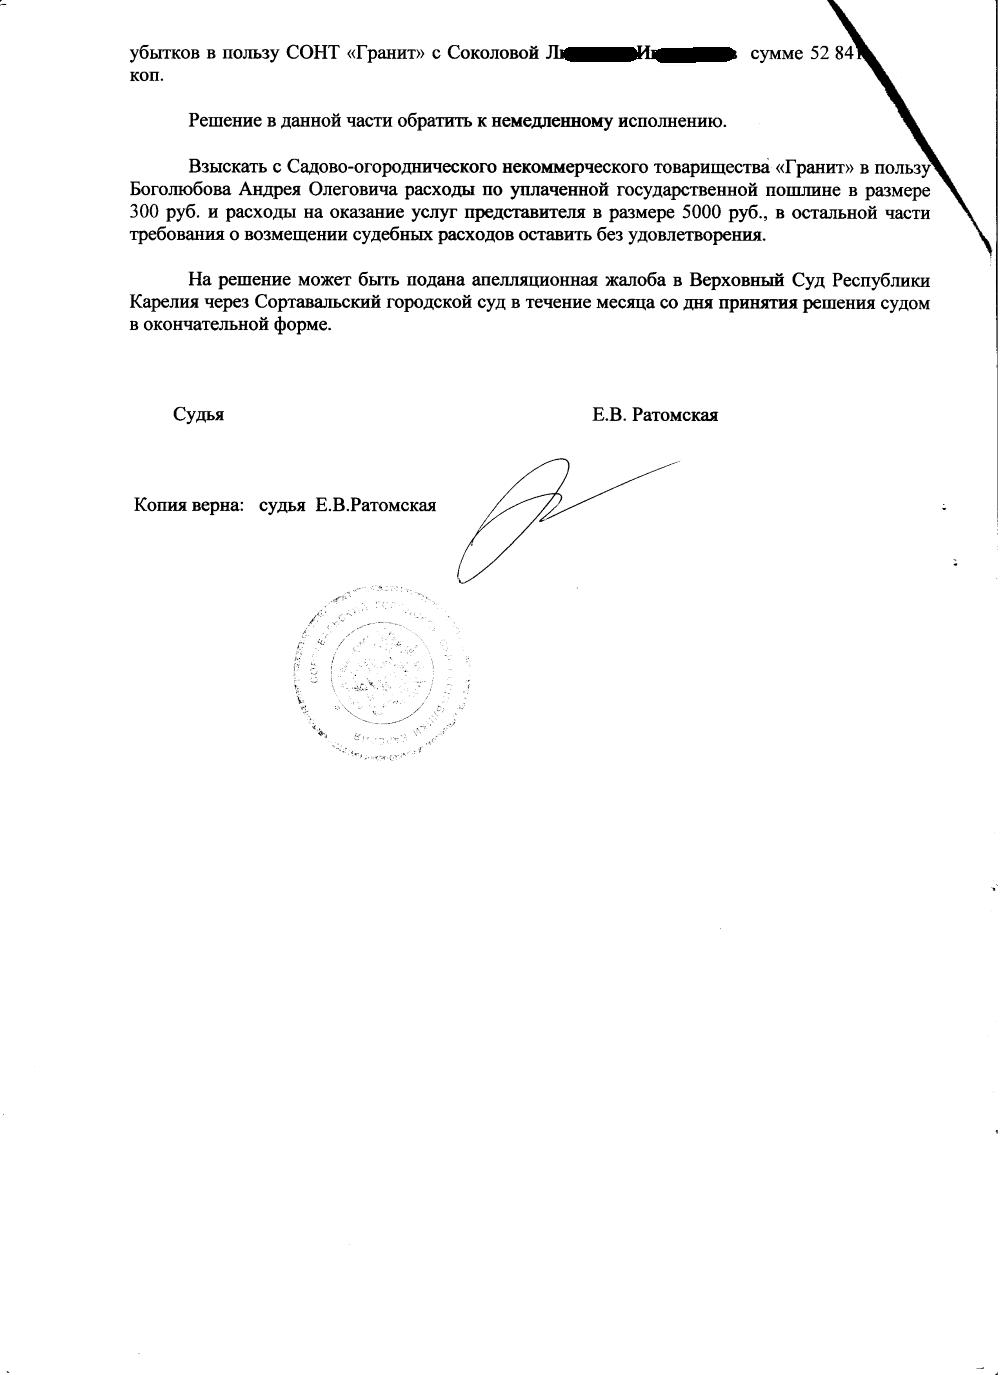 https://sontgranit.ru/forum/img/sokol/20180510-решение-08.png